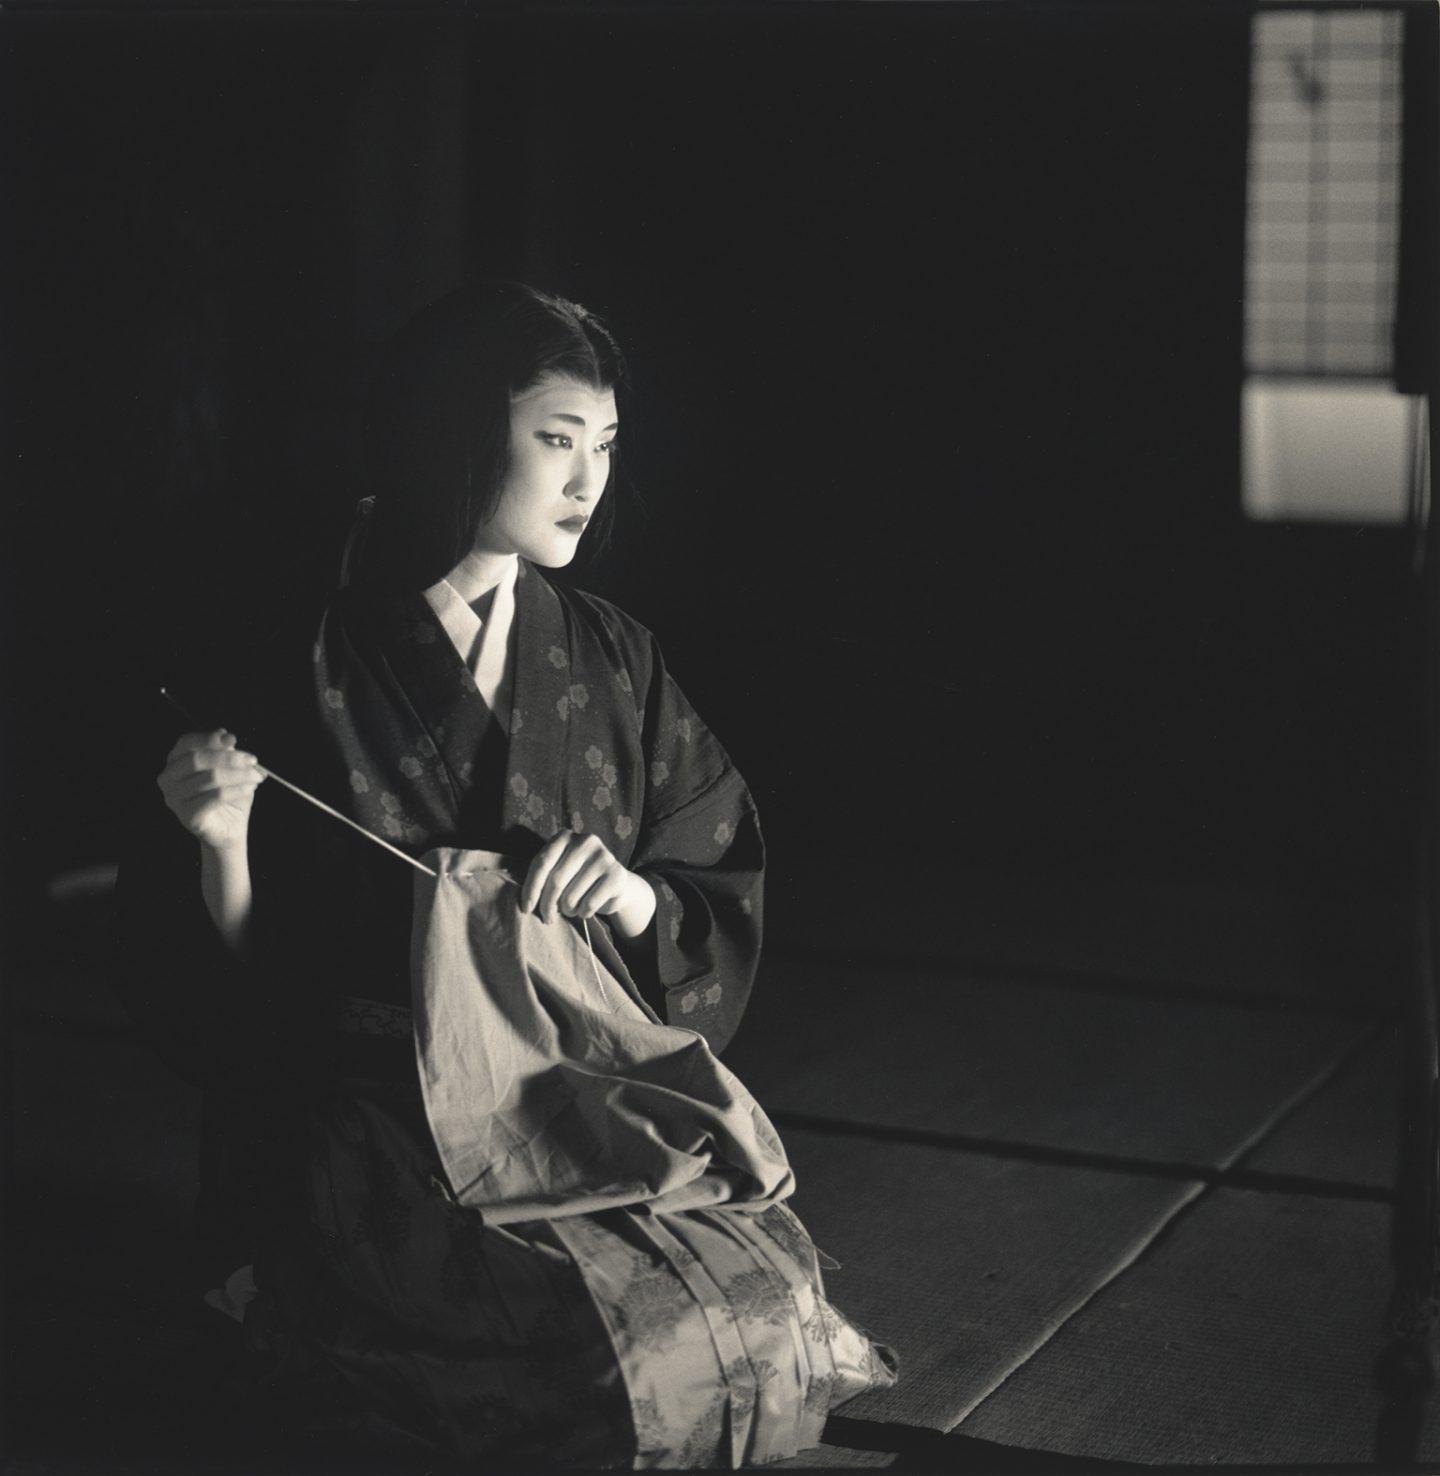 IGNANT-Photography-Hiroshi-Watanabe-Kwaidan-016